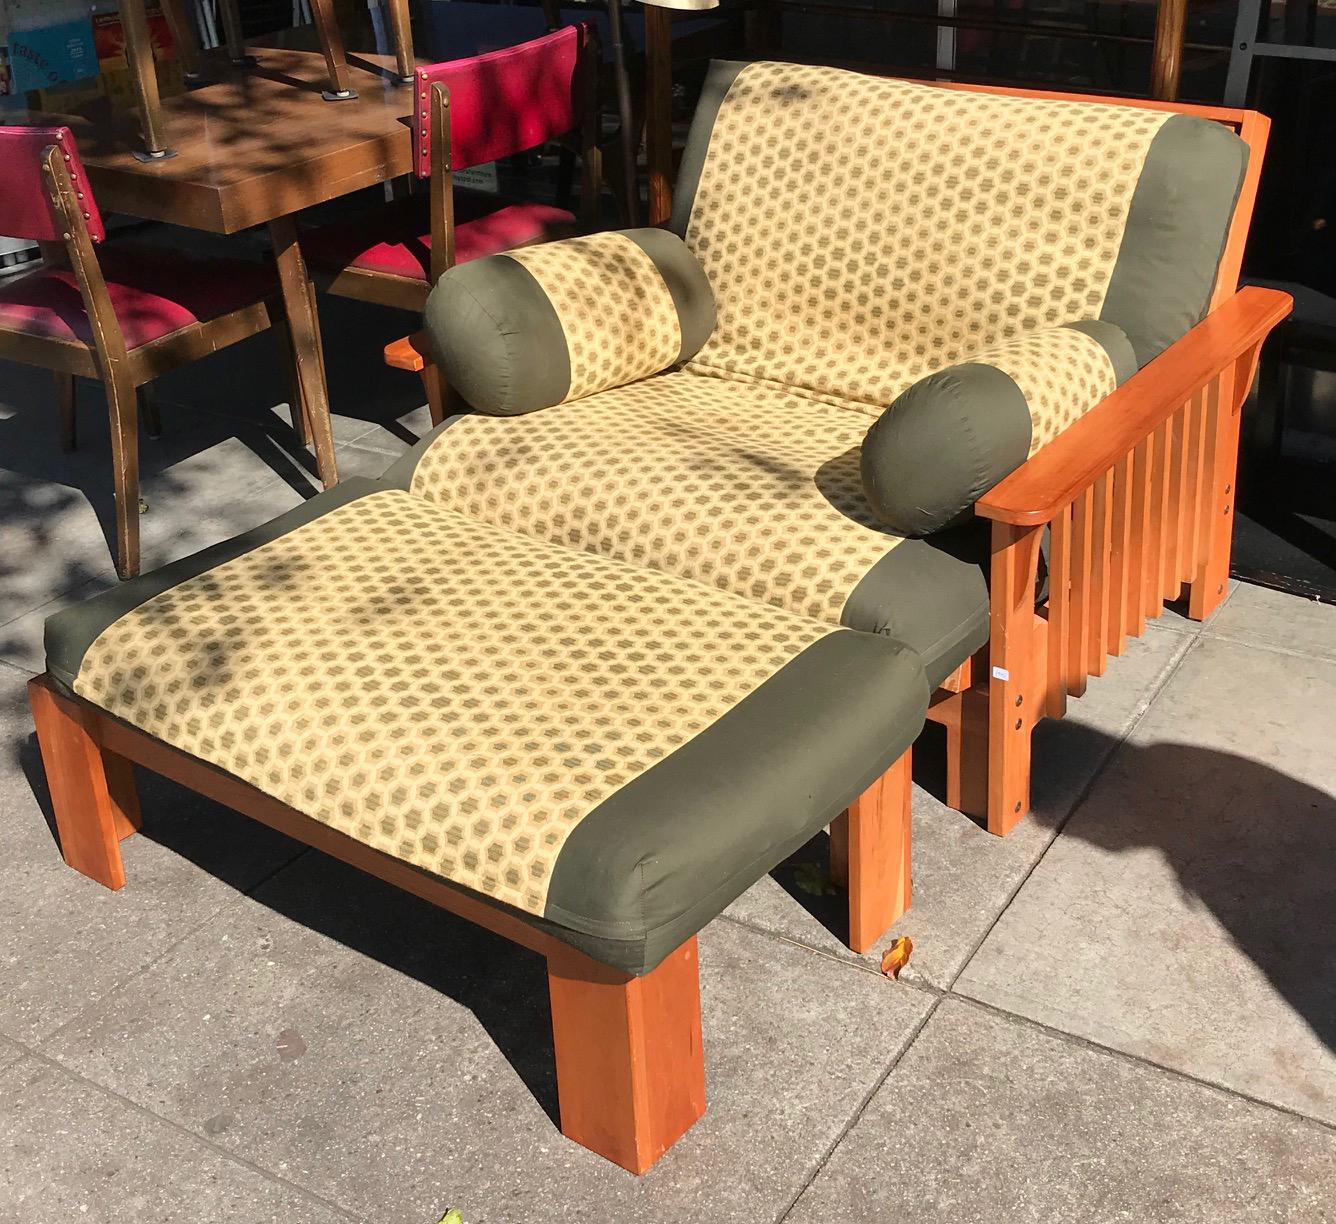 Wondrous Uhuru Furniture Collectibles Sold 25732 Mission Cherry Frankydiablos Diy Chair Ideas Frankydiabloscom